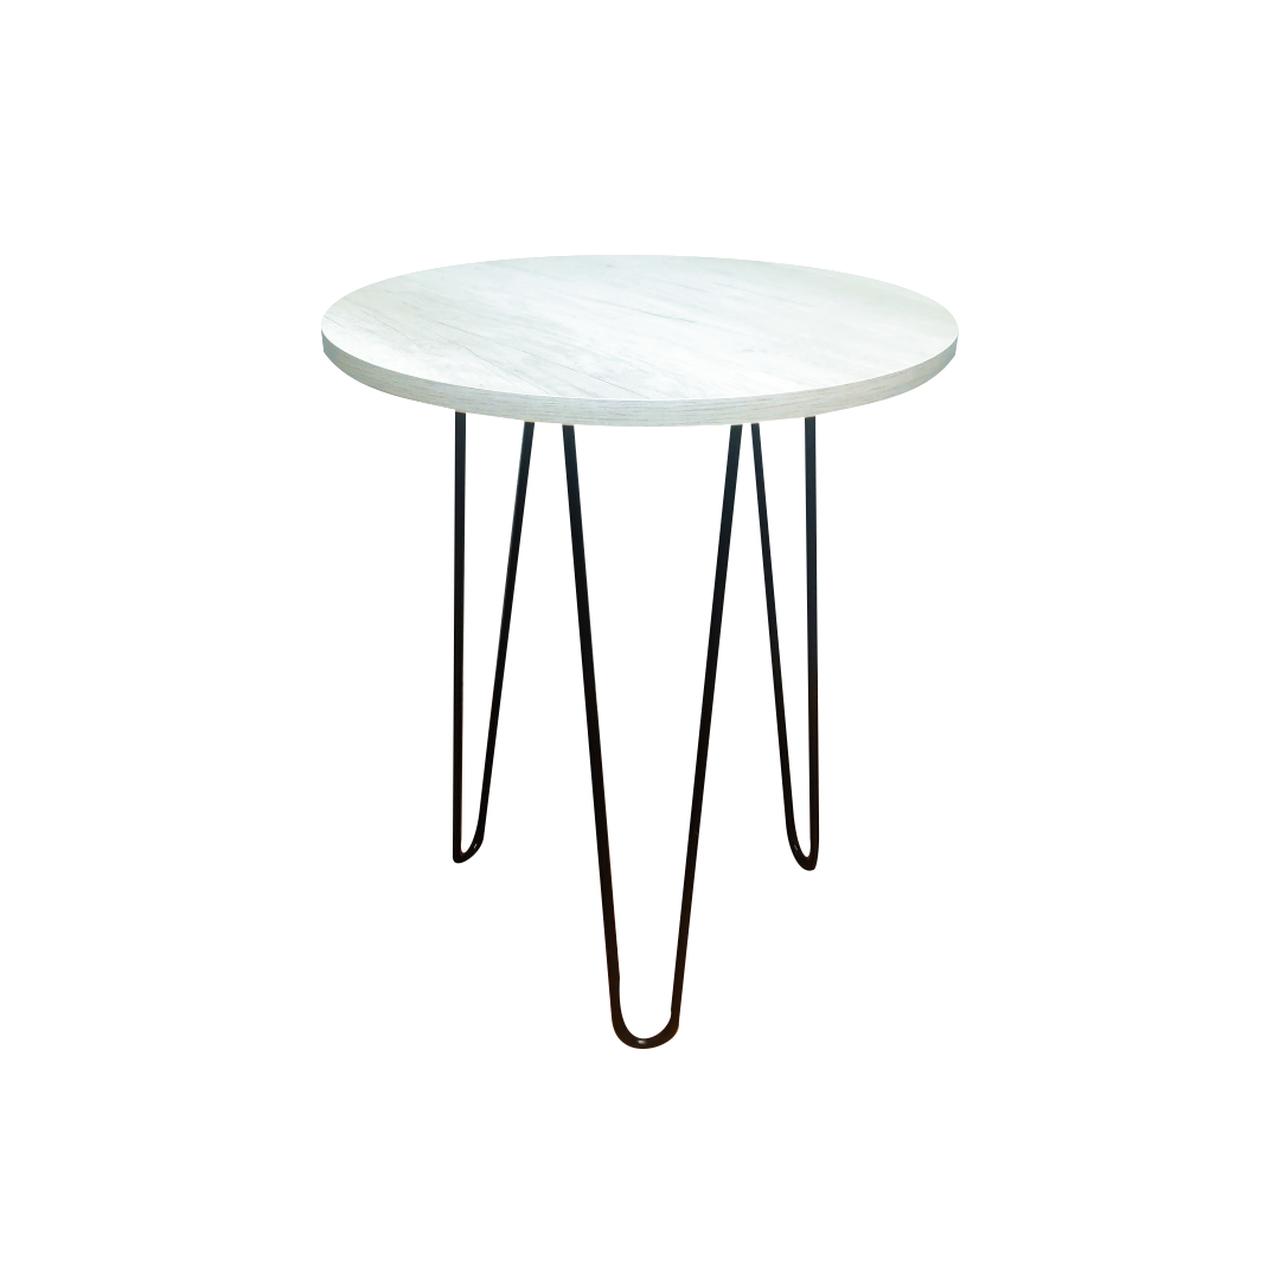 Mesa de Apoio 35 cm com Hairpin Legs e Tampo 100% MDF  - Mtne Store